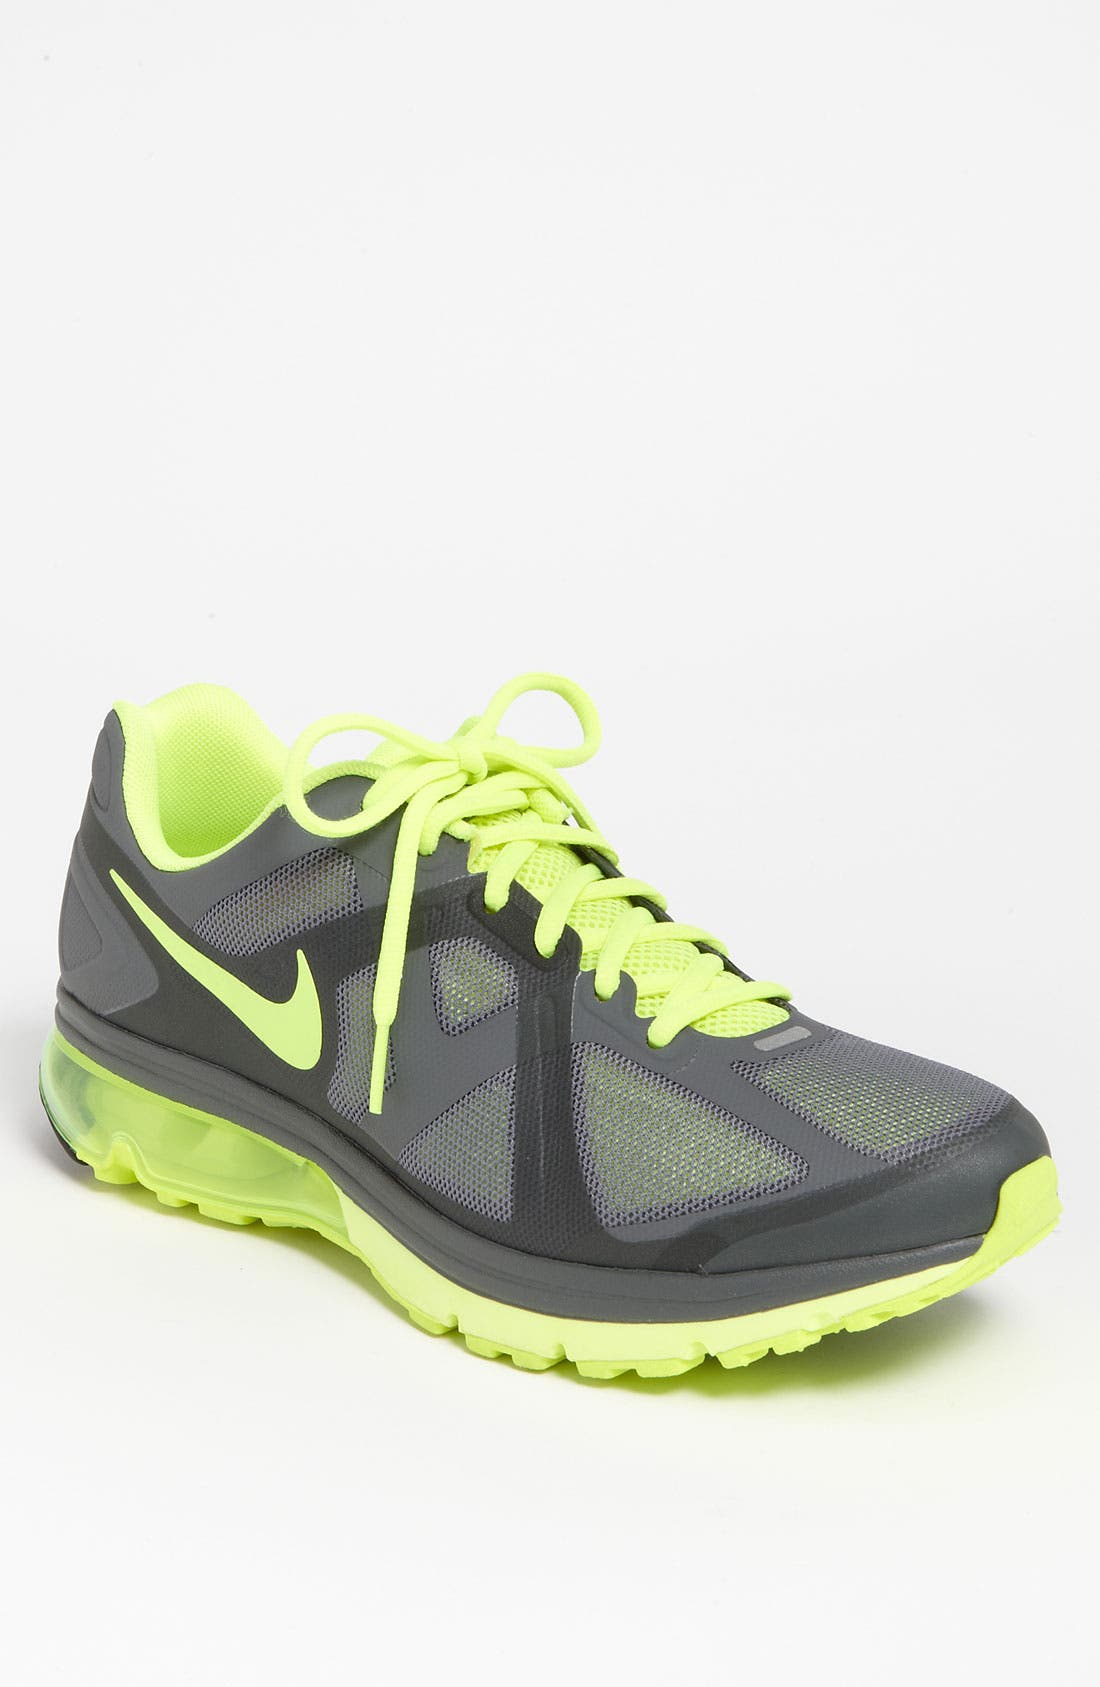 Main Image - Nike 'Air Max Excellerate+' Running Shoe (Men)